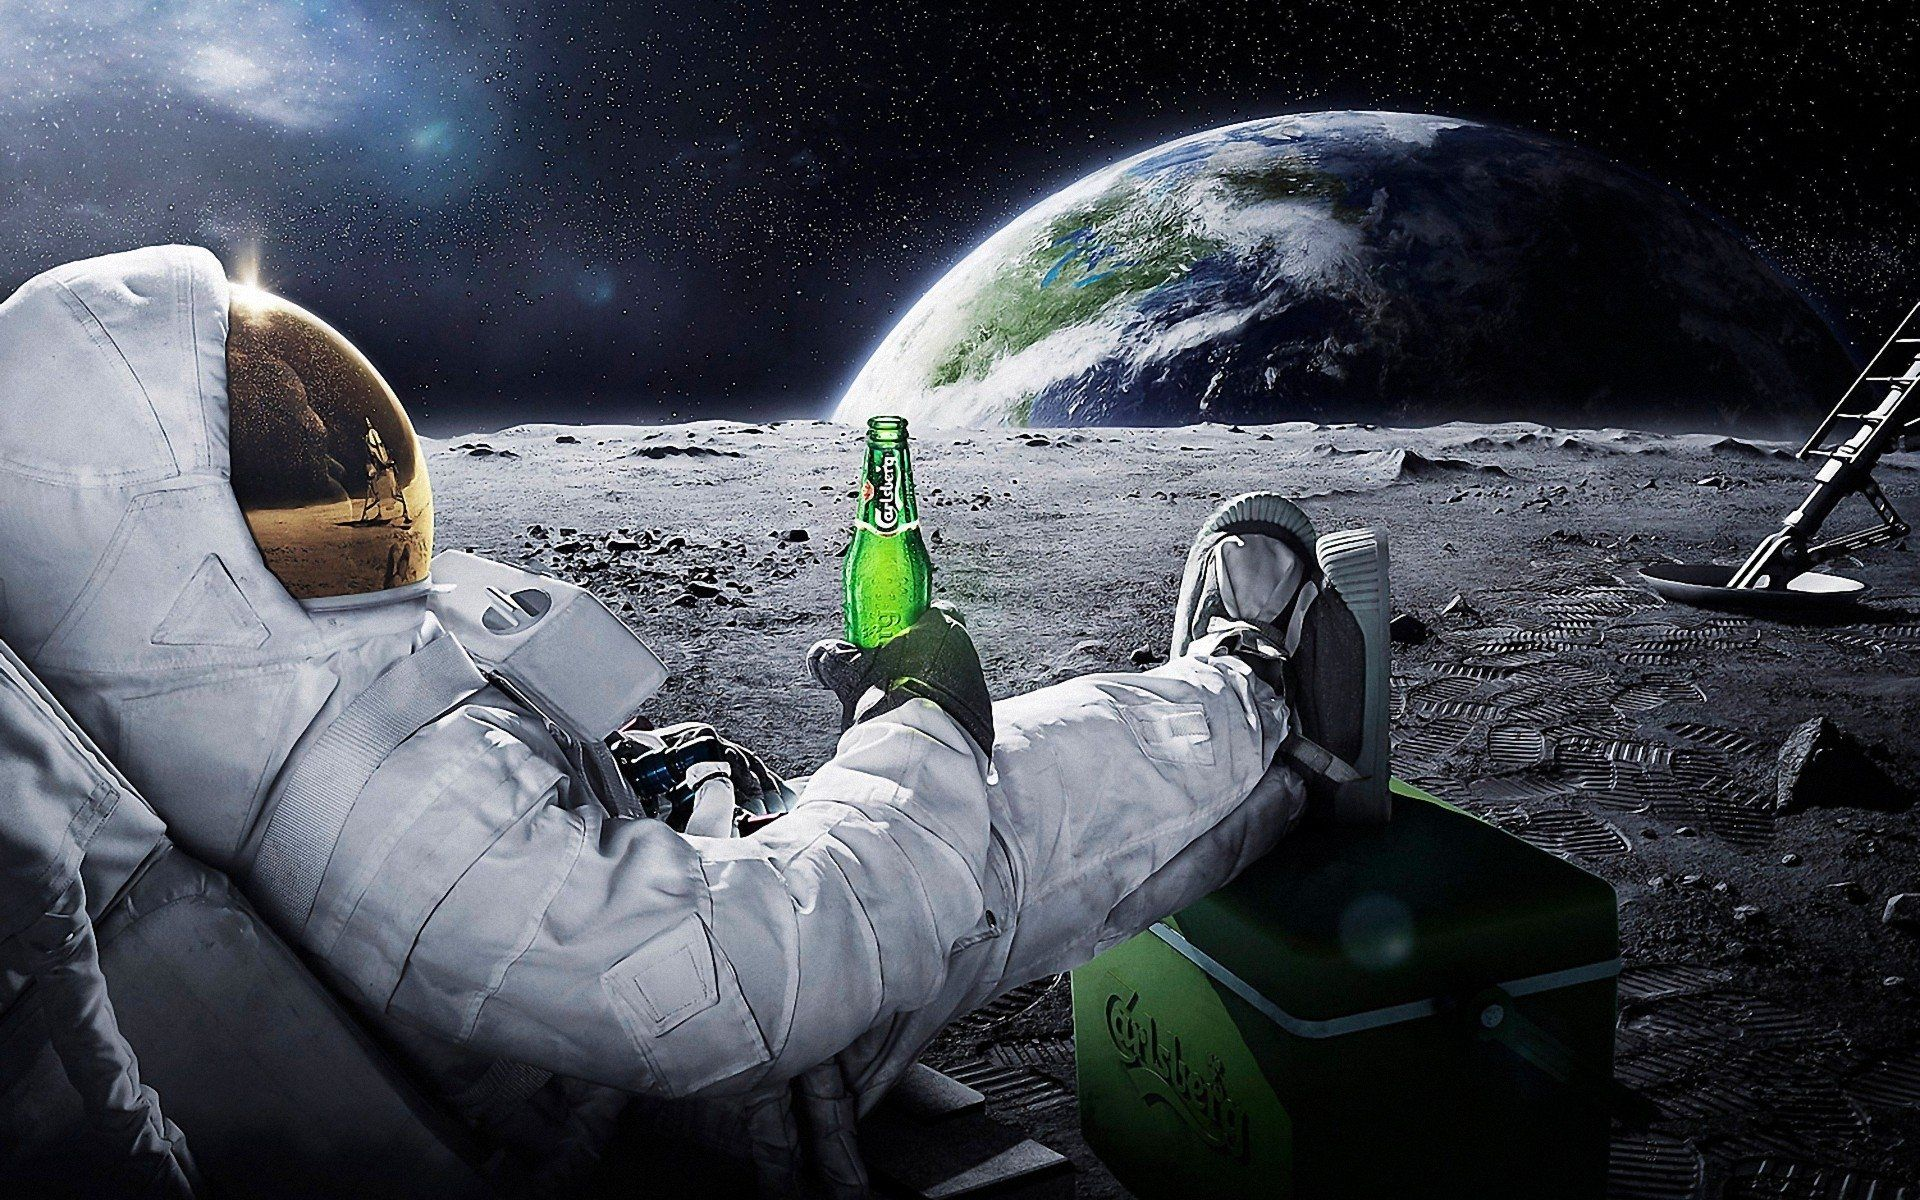 Astronaut Desktop Wallpapers Top Free Astronaut Desktop Backgrounds Wallpaperaccess